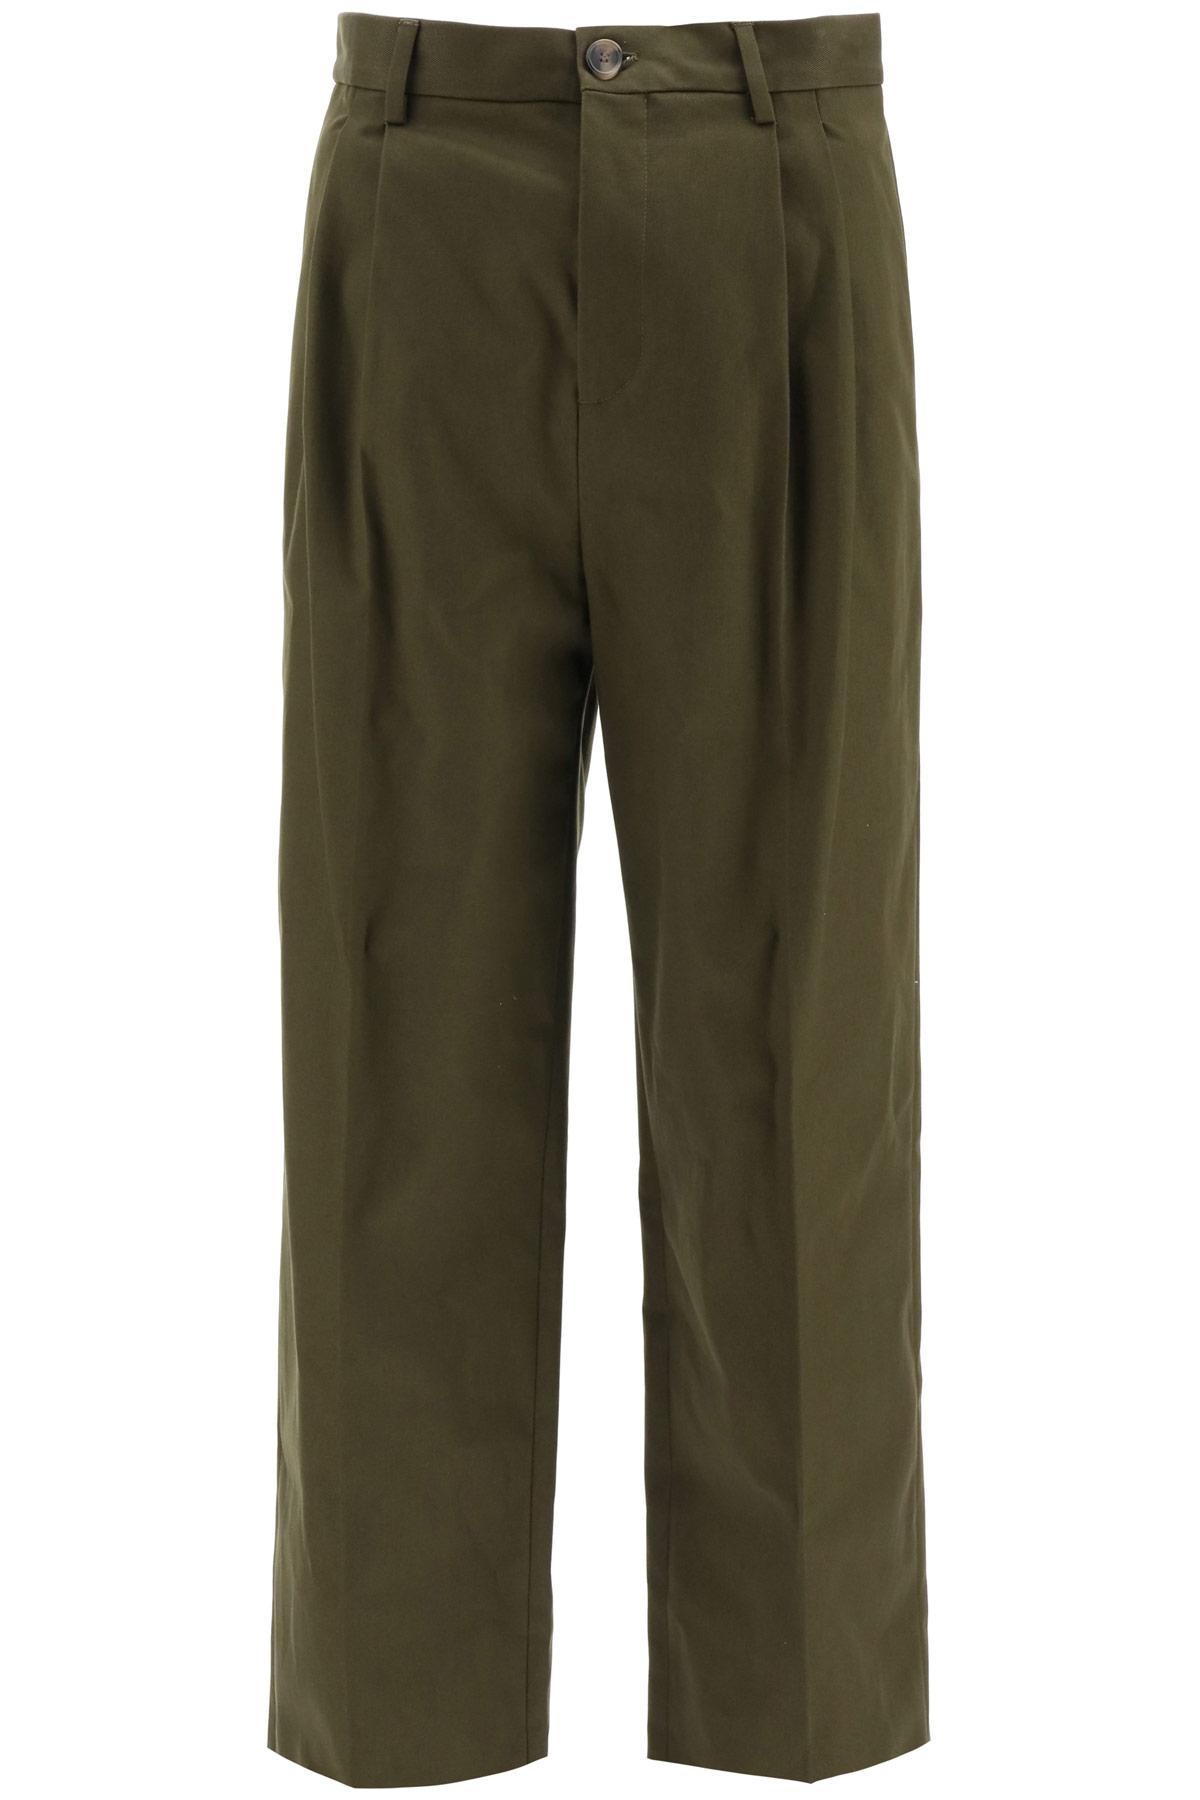 LOEWE CHINO TROUSERS ANAGRAM EMBROIDERY 50 Khaki, Green Cotton